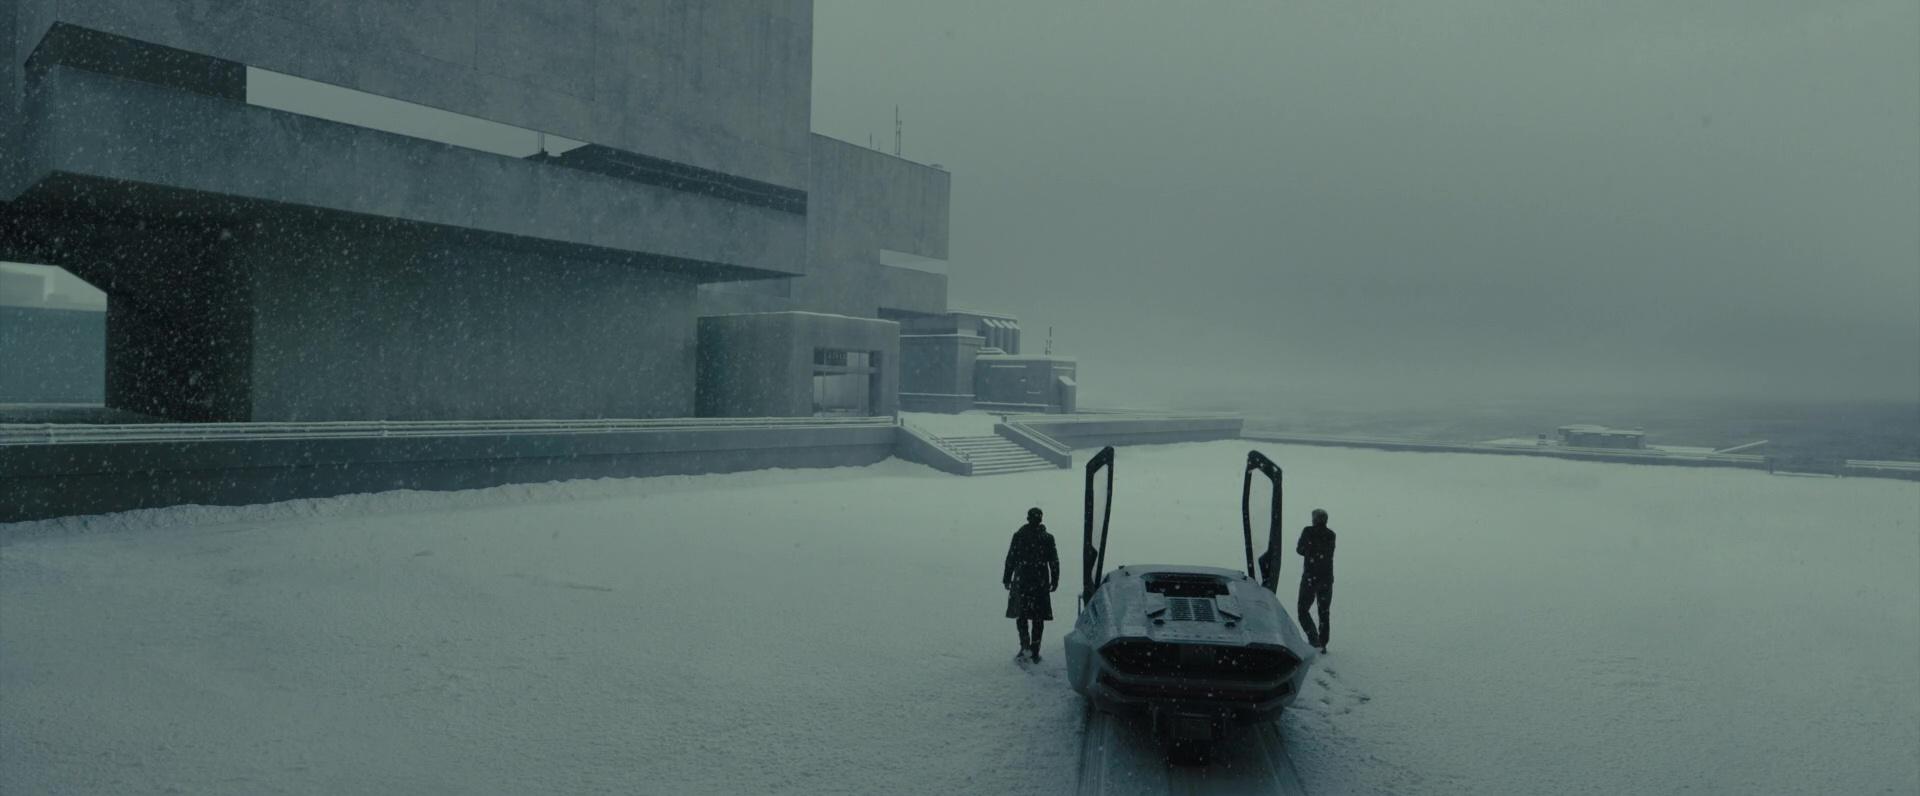 2017 Corvette Stingray >> Peugeot Car Used by Ryan Gosling in Blade Runner 2049 (2017) Movie